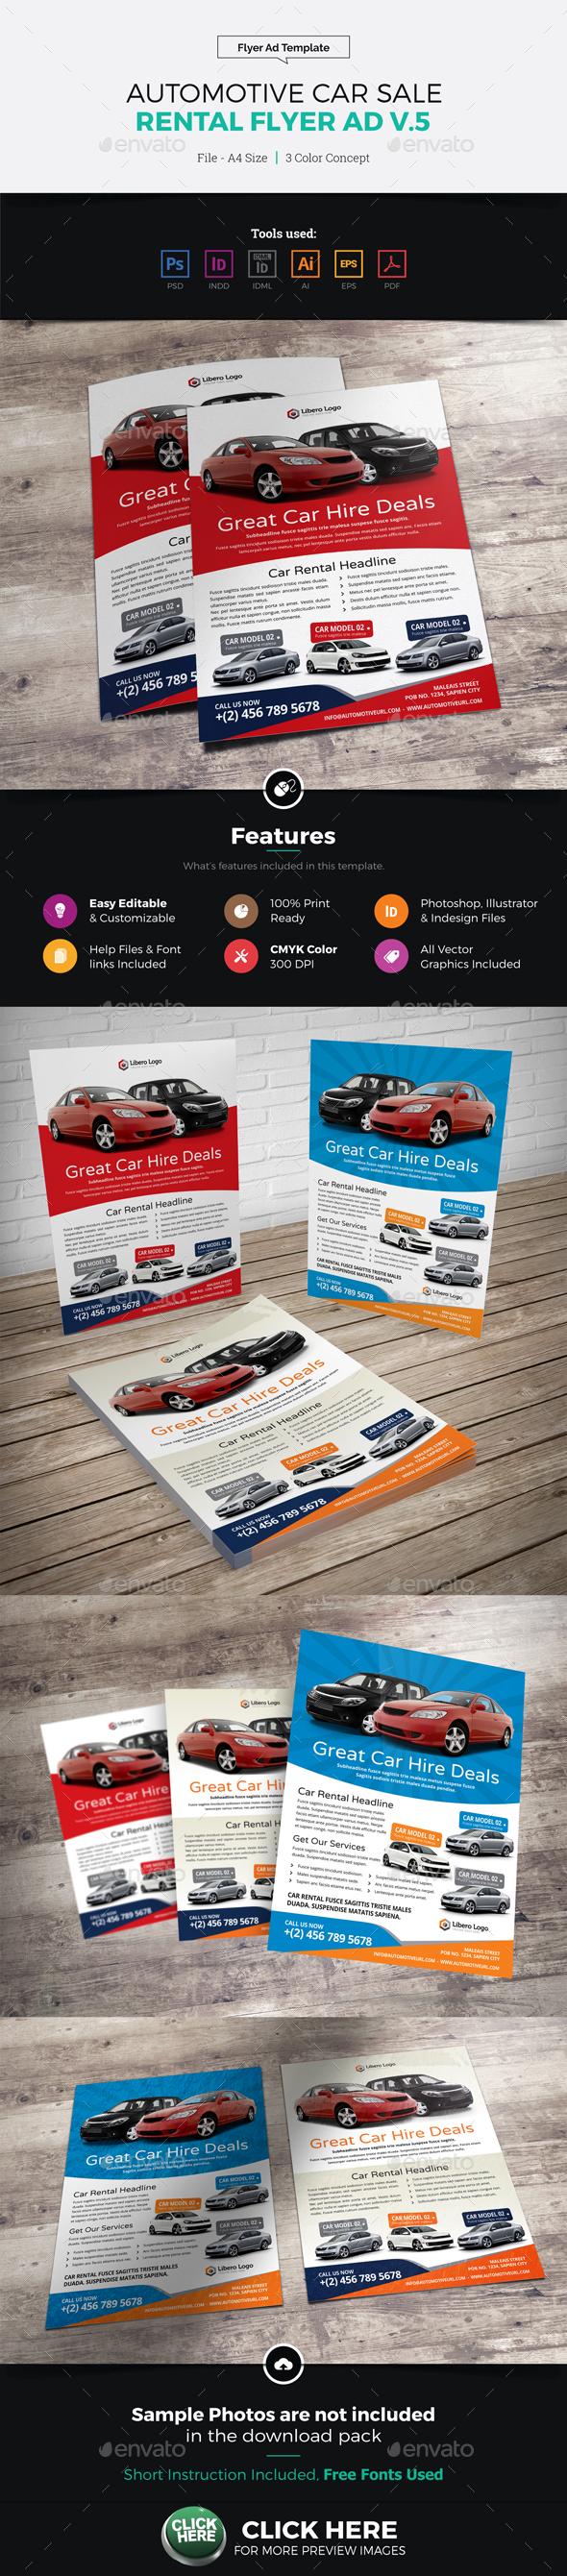 Automotive Car Sale Rental Flyer Ad v5 - Corporate Flyers